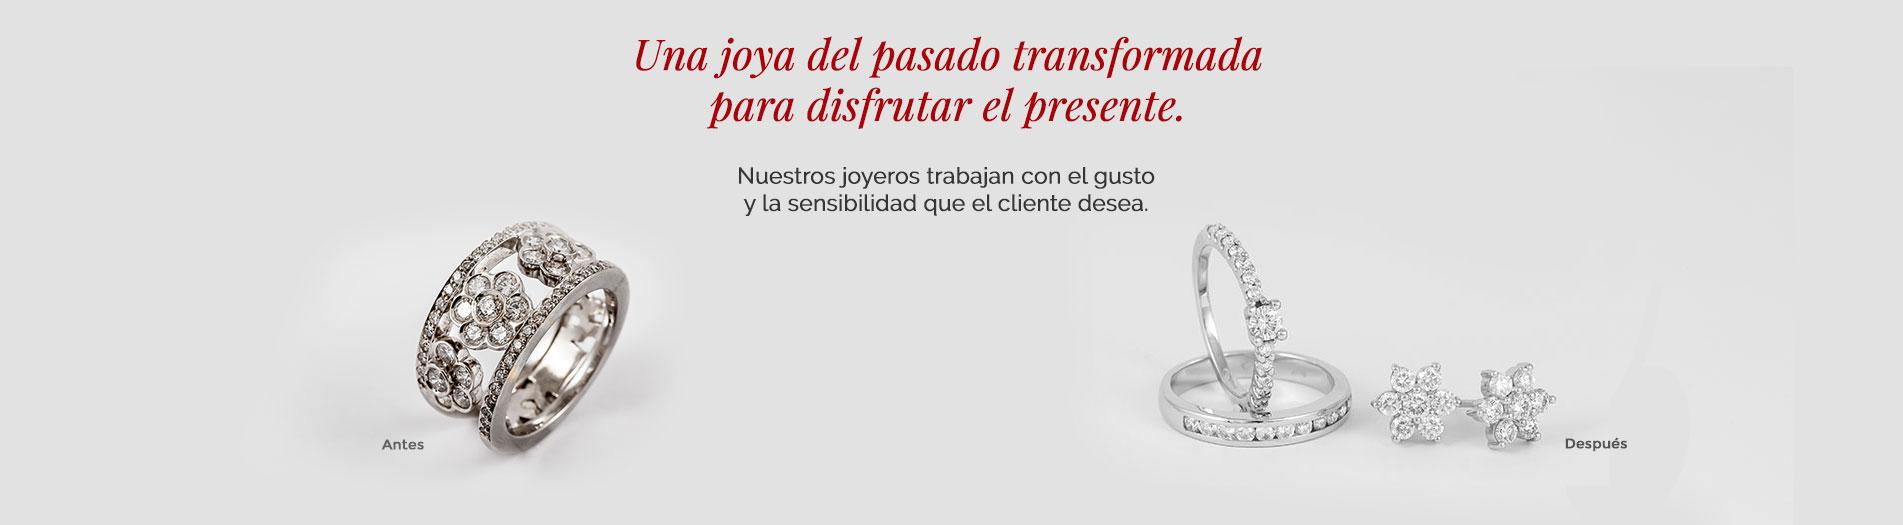 Transform-joyas